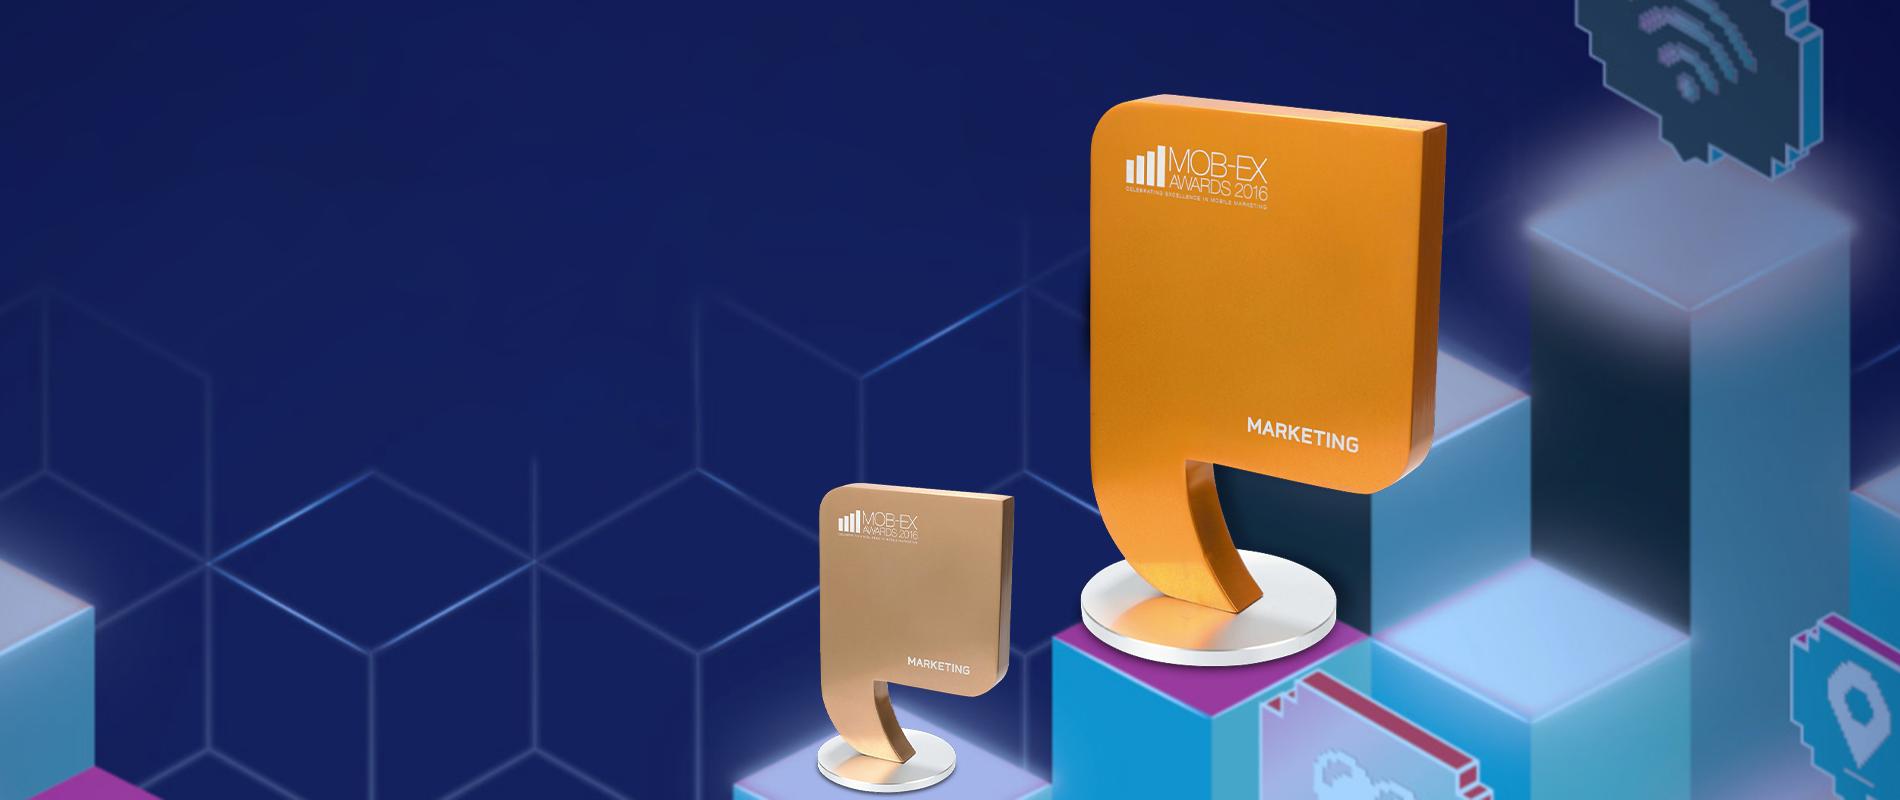 Kingdom Digital nabs 2 awards at Mob-Ex Awards 2020